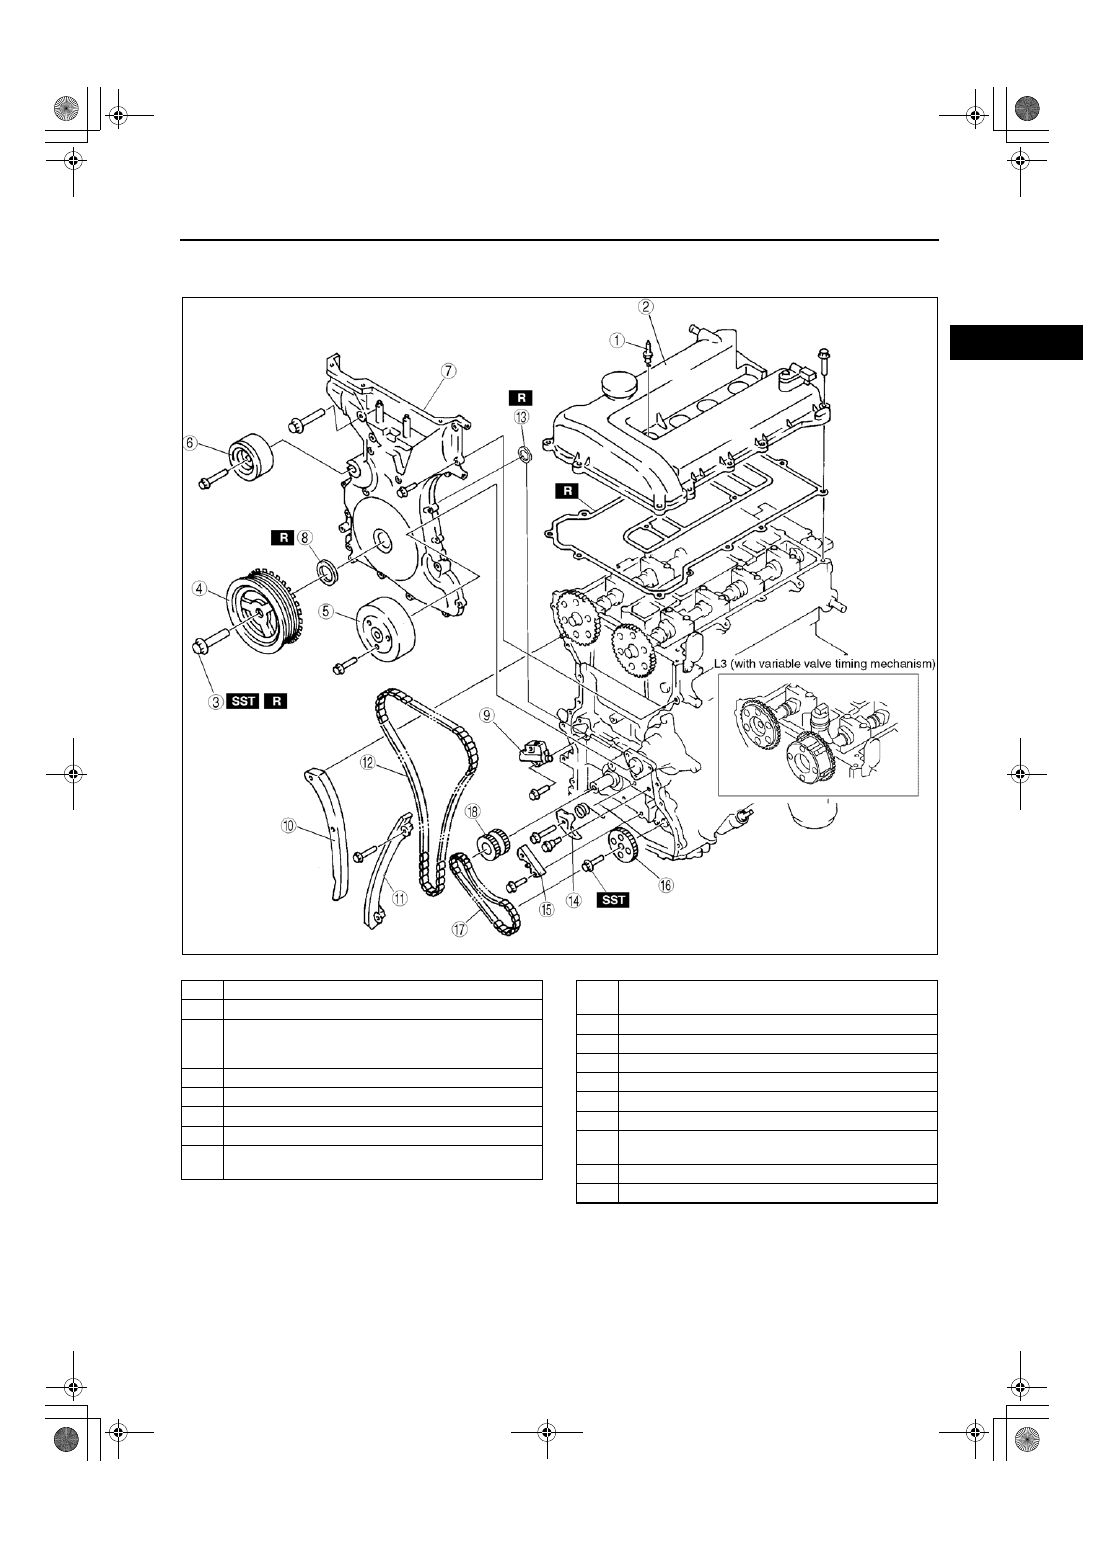 Mazda Engine L8 Lf L3 Manual Part 5 Valve Timing Diagram